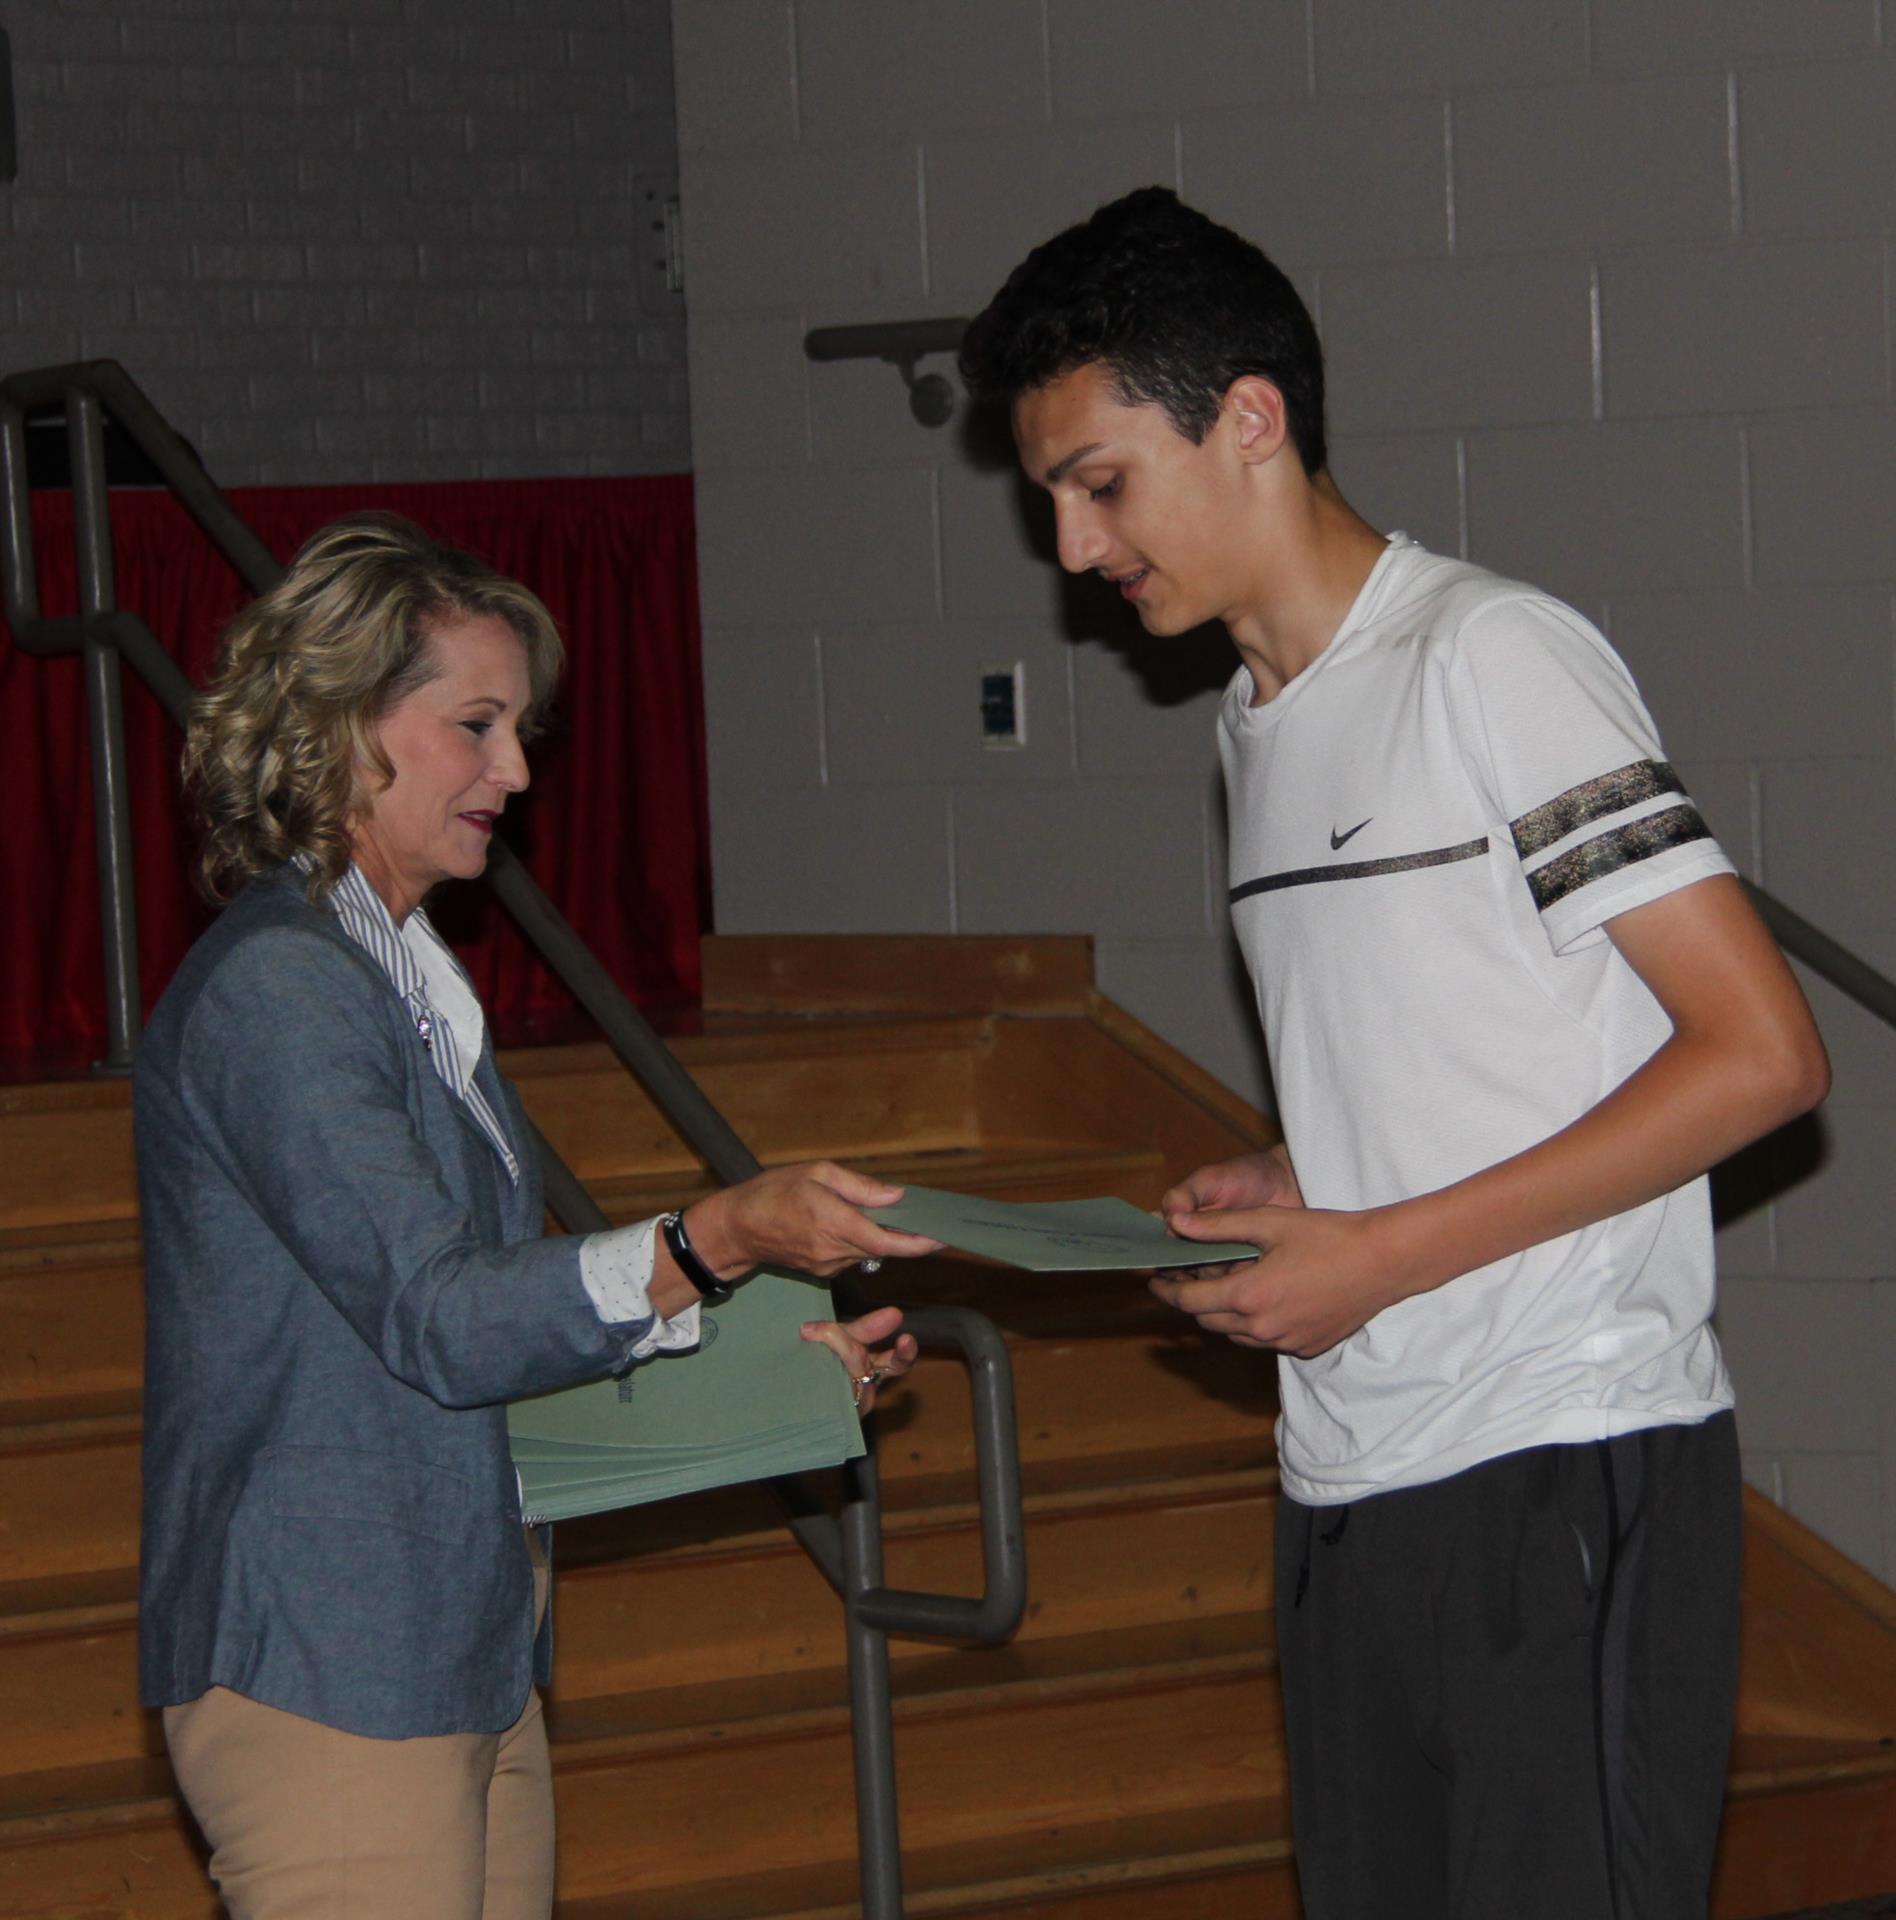 legislator handing student certificate